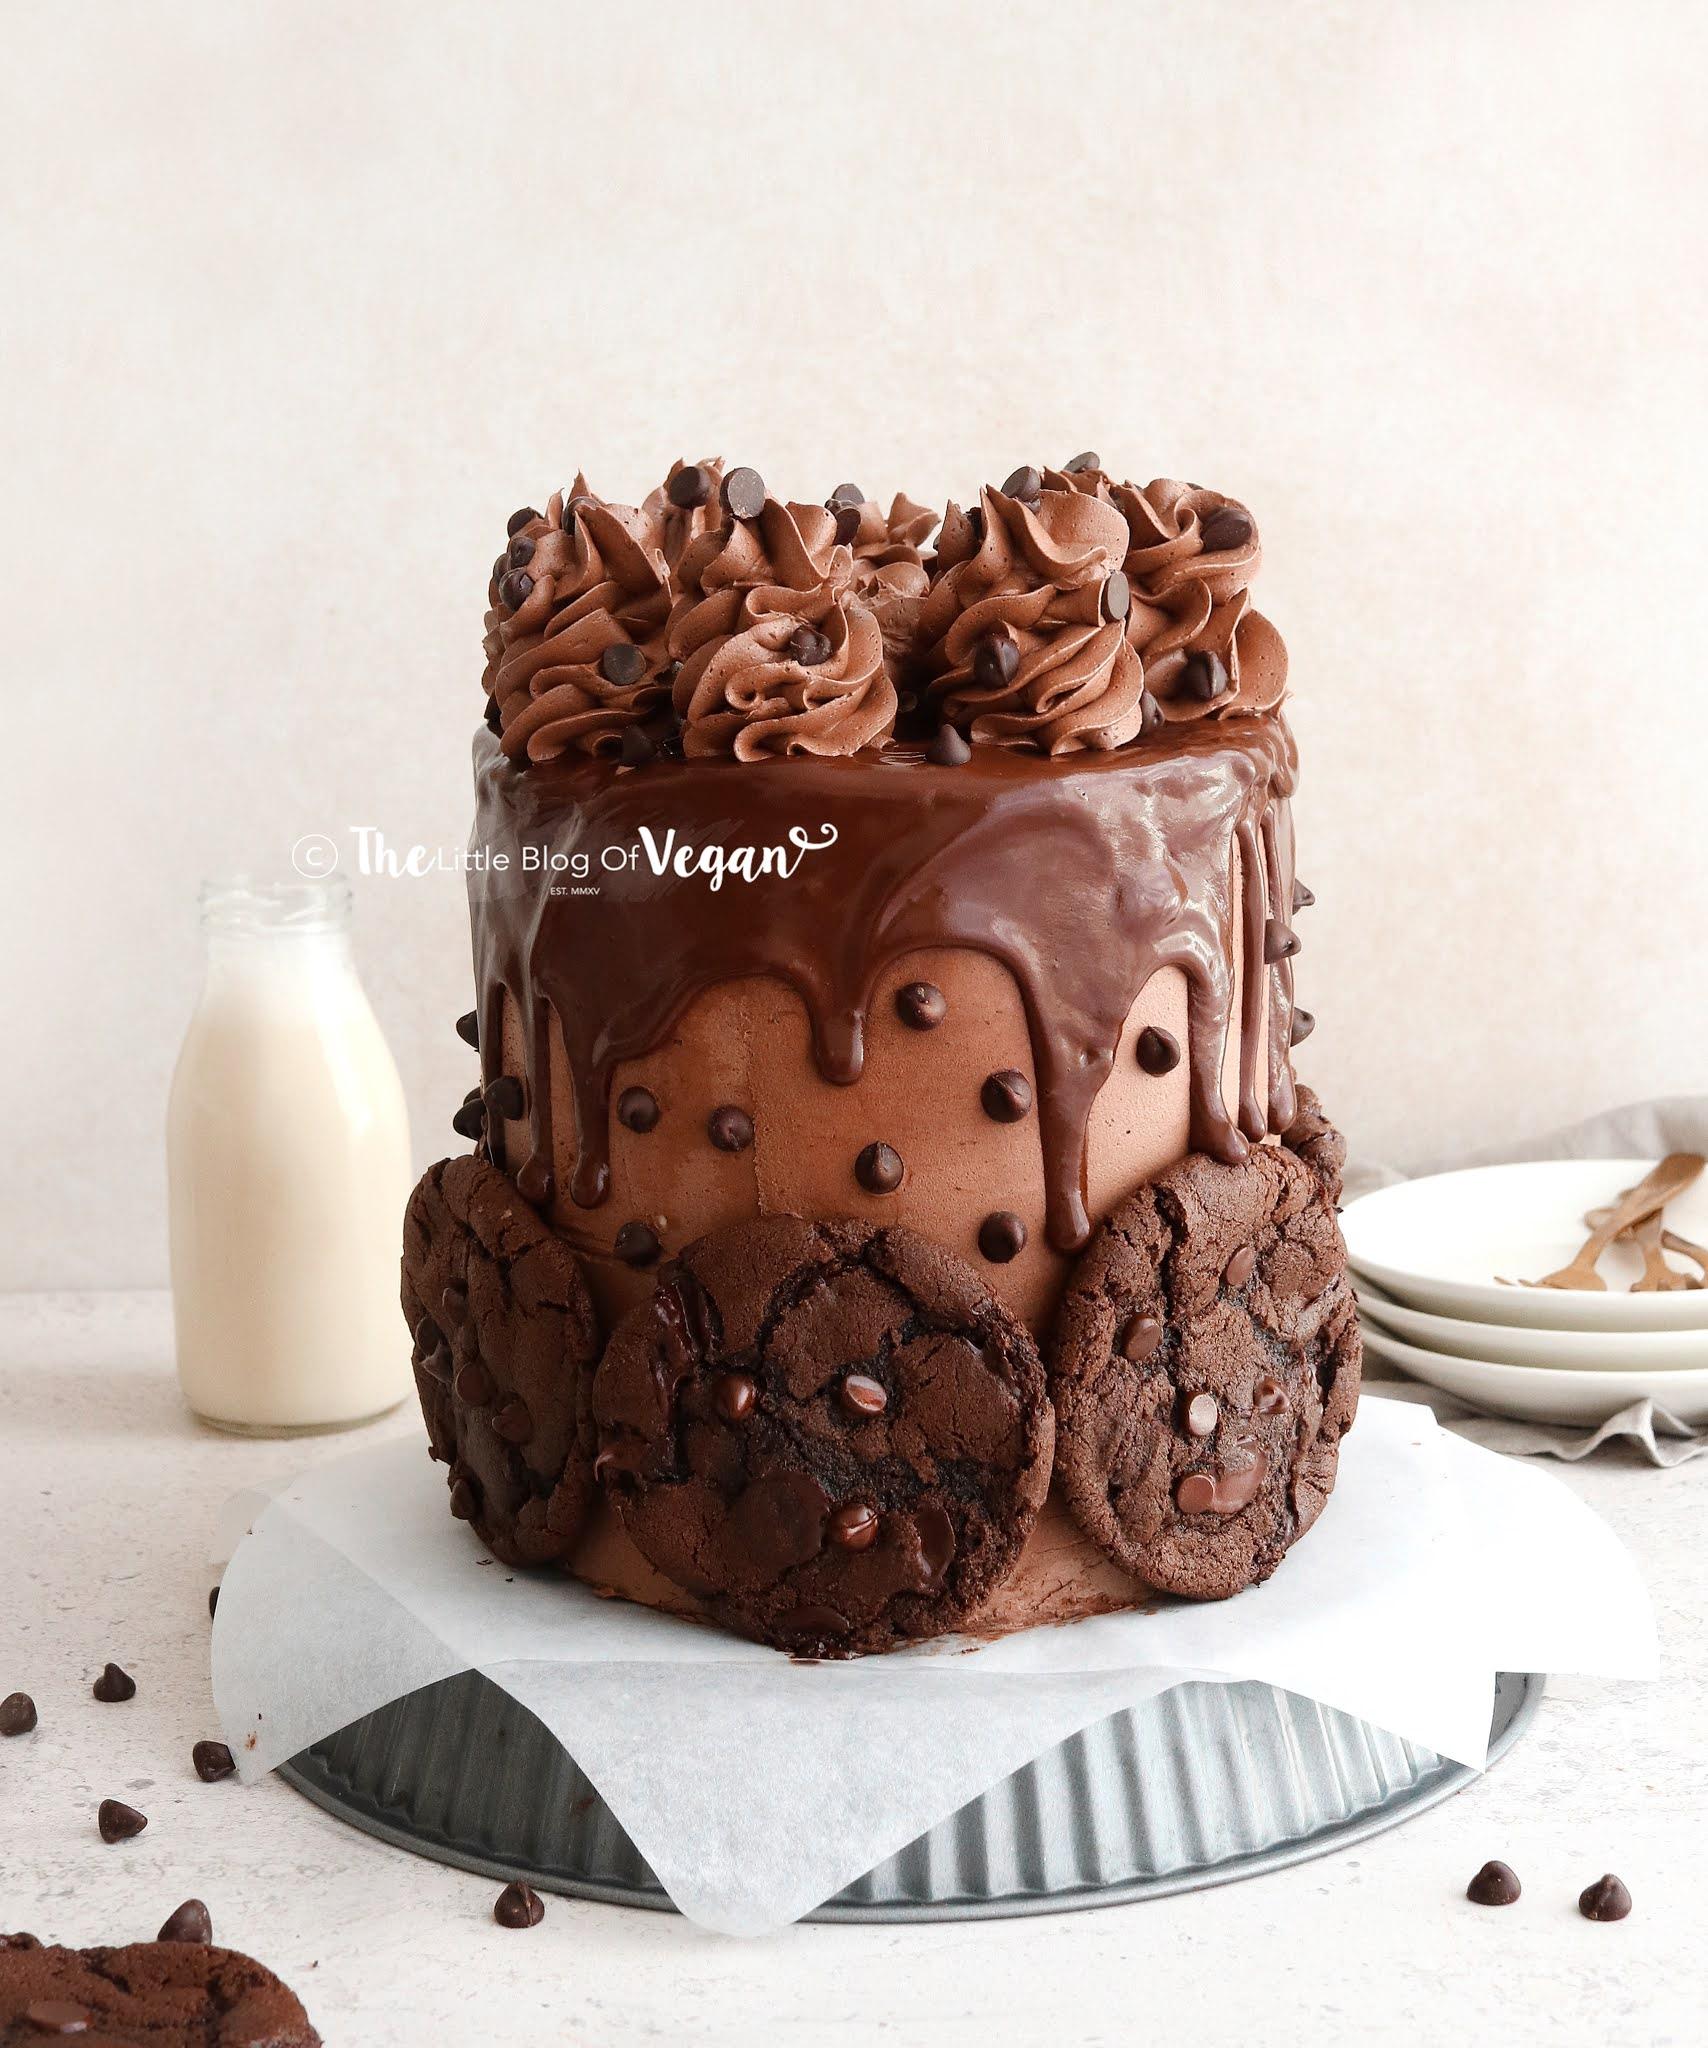 Vegan-chocolate-cookie-cake